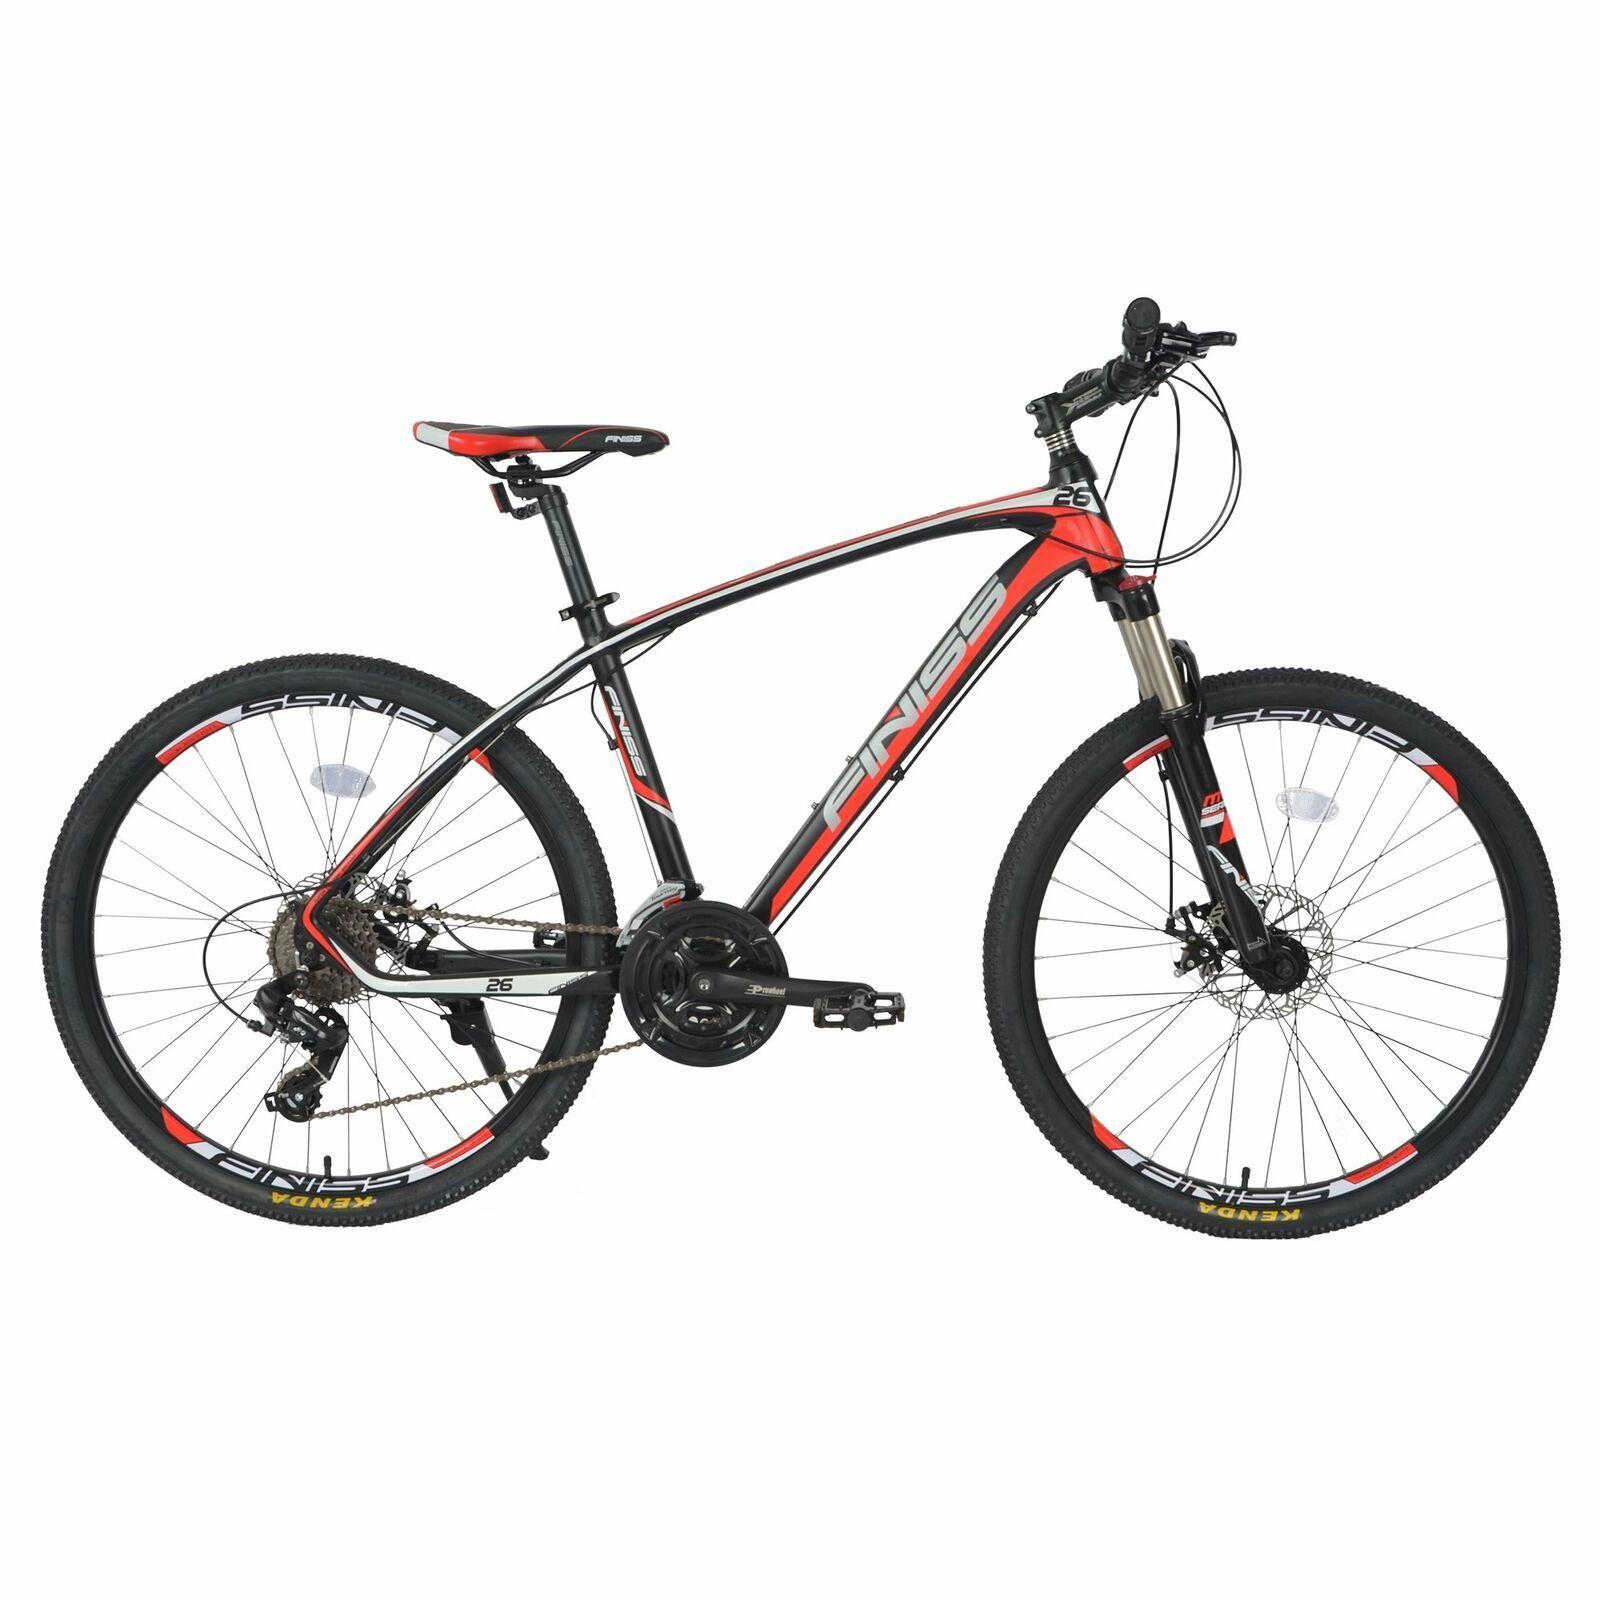 26 Aluminium Frame Mountain Bike Disc Brakes Mens Bikes 24 Speed